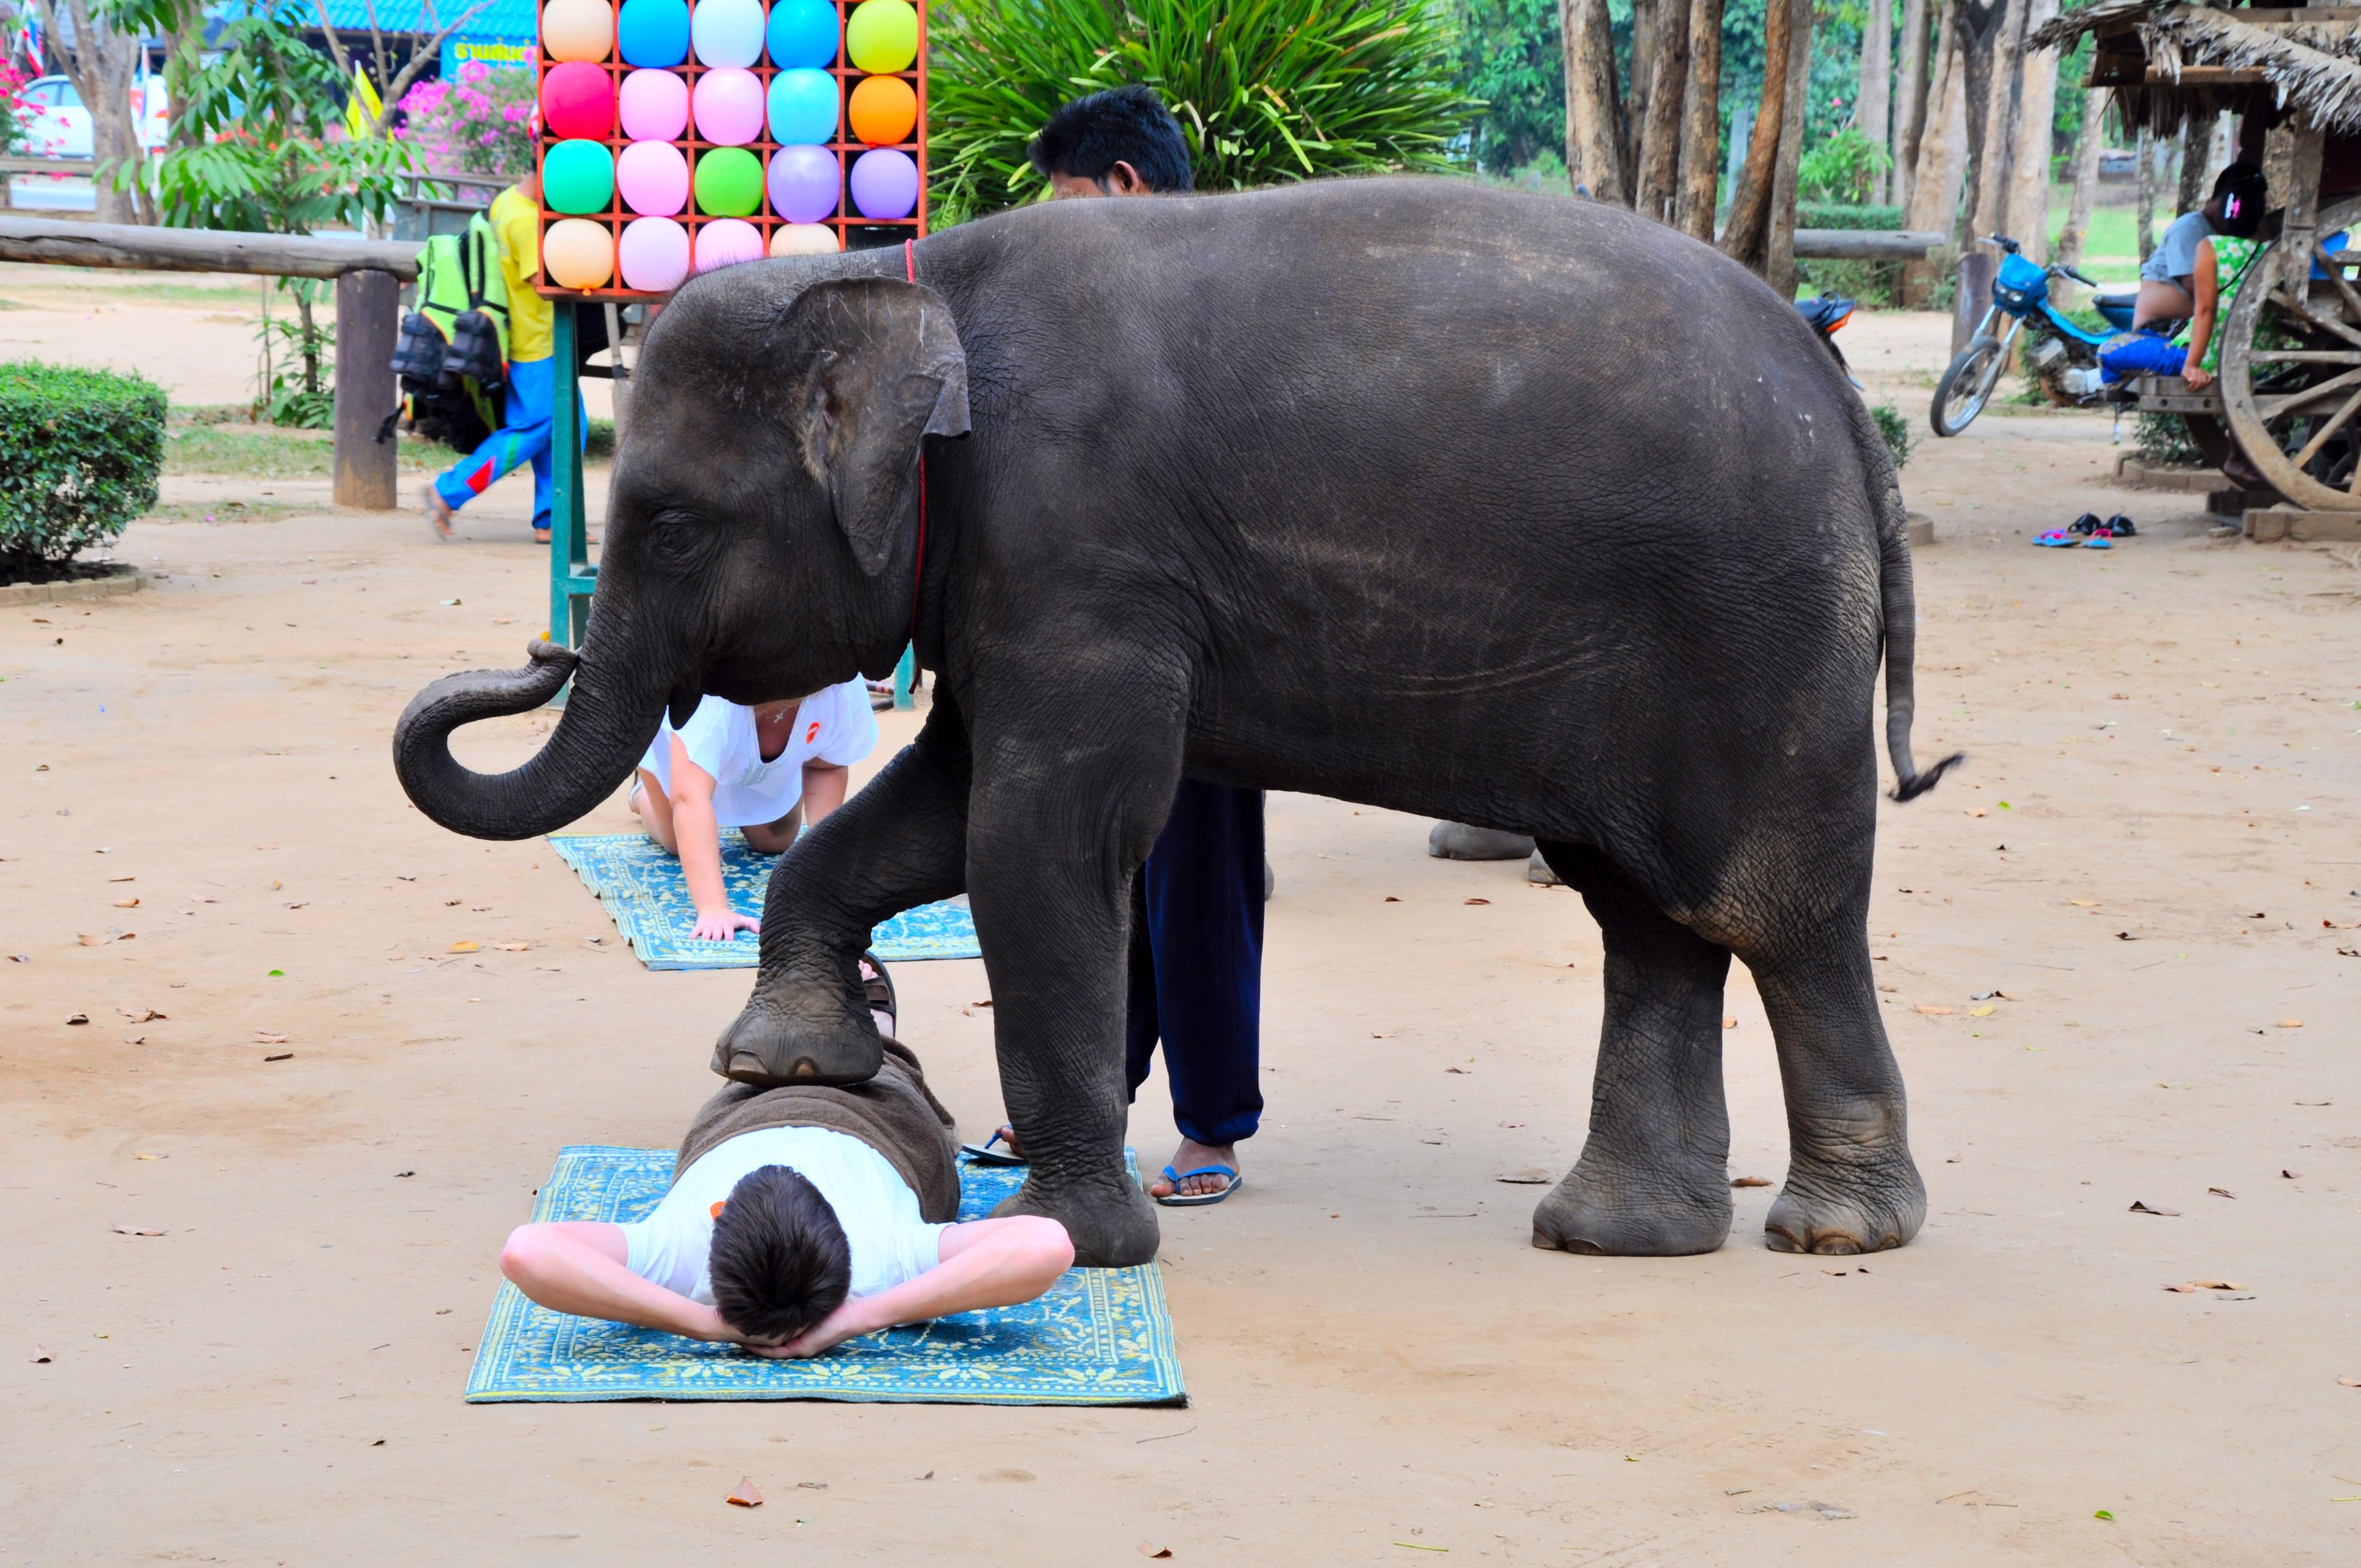 Турист пробует массаж у слона